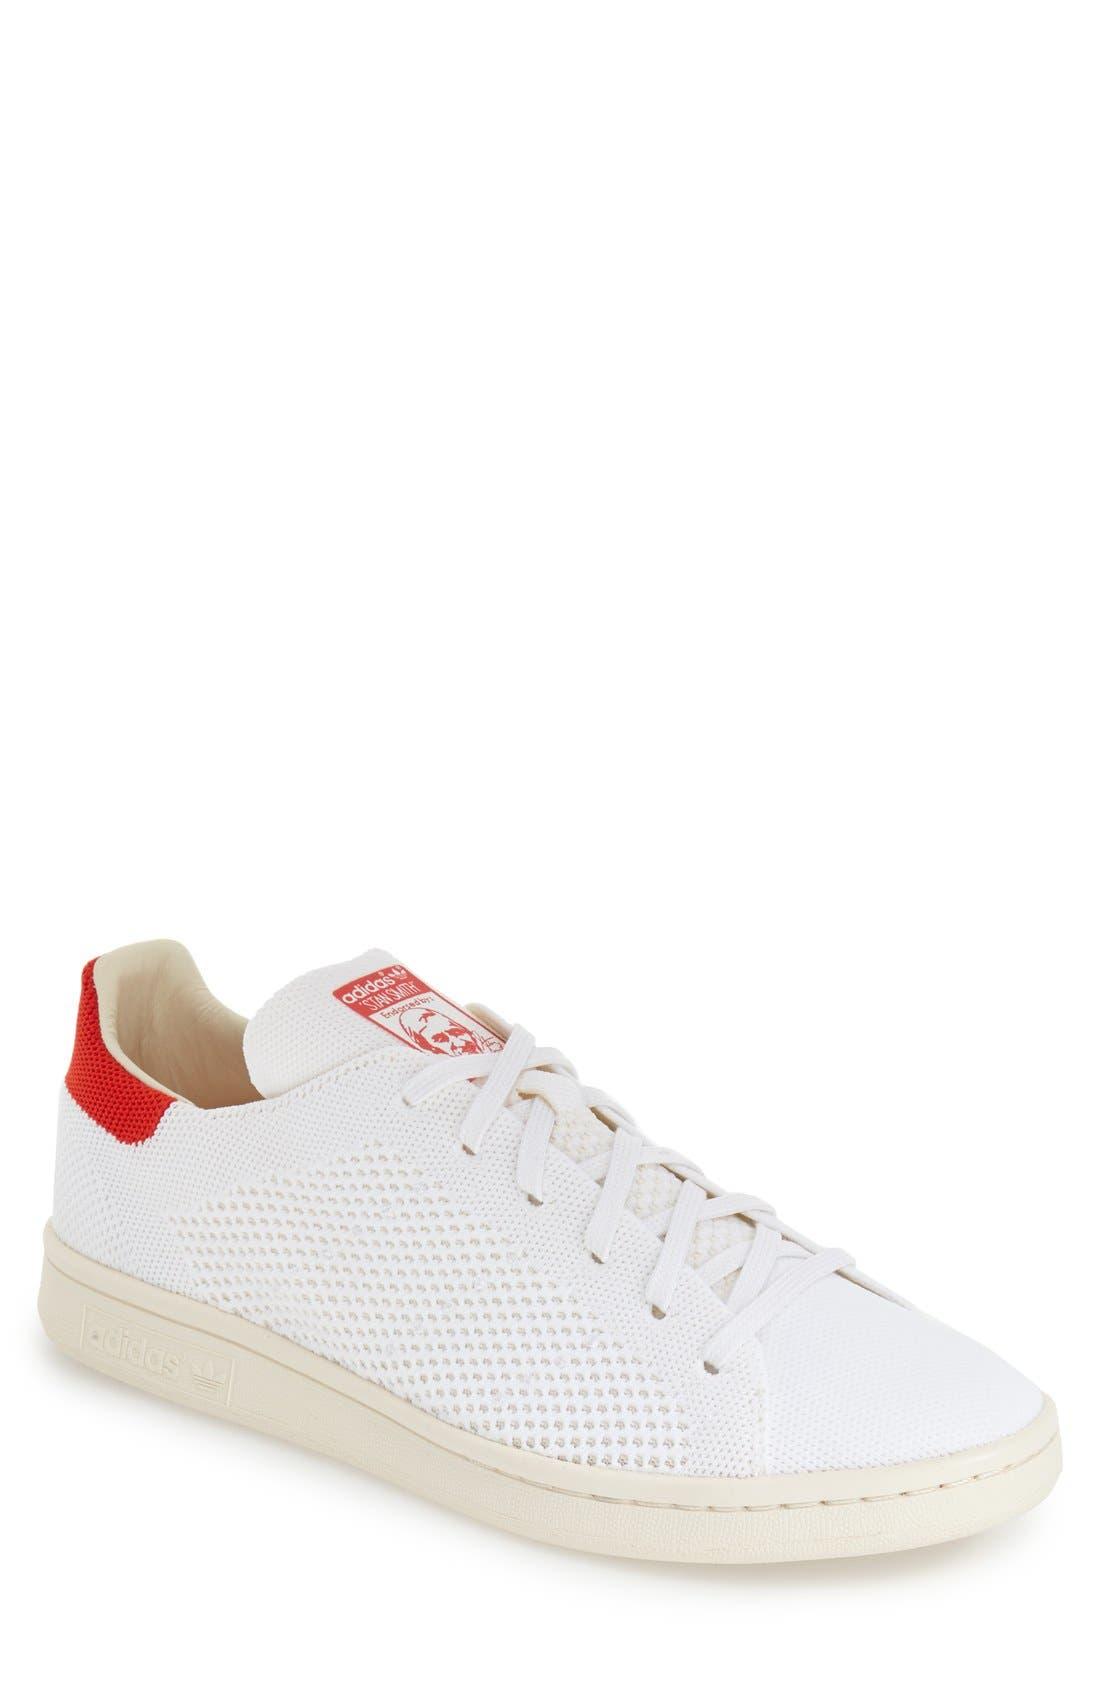 ADIDAS Stan Smith OG Primeknit Sneaker